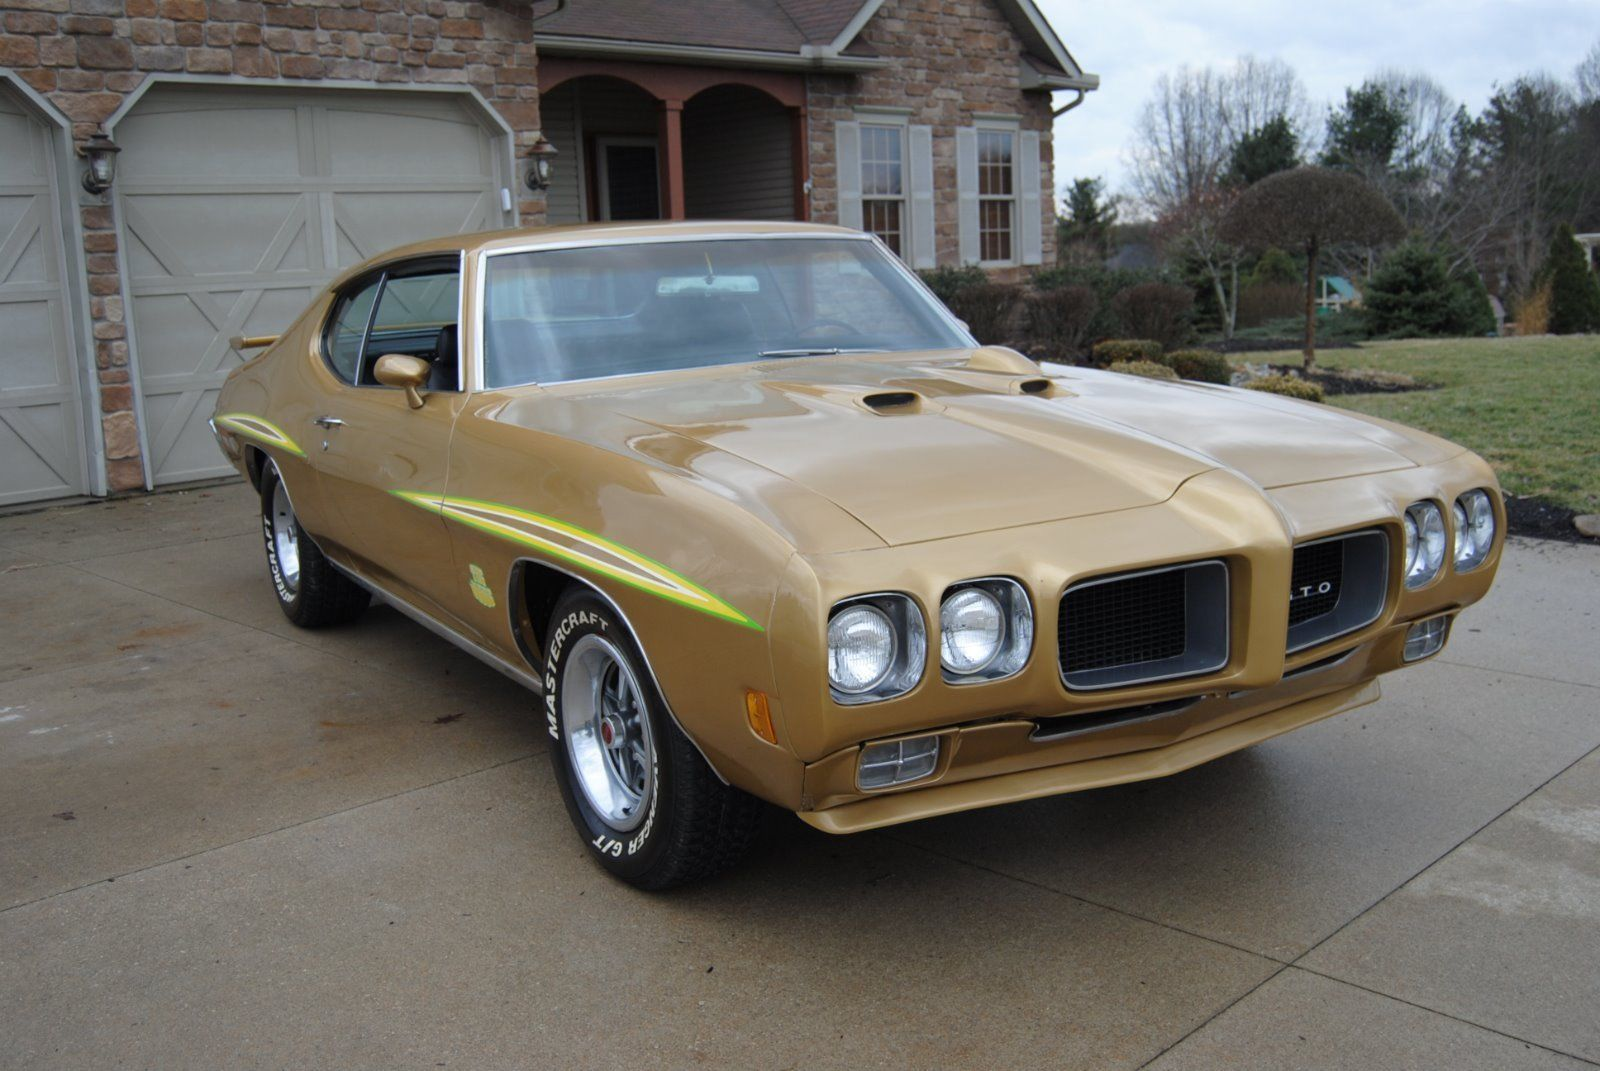 1970 Pontiac Gto Gto Pontiac Gto Vintage Muscle Cars Classic Cars Muscle